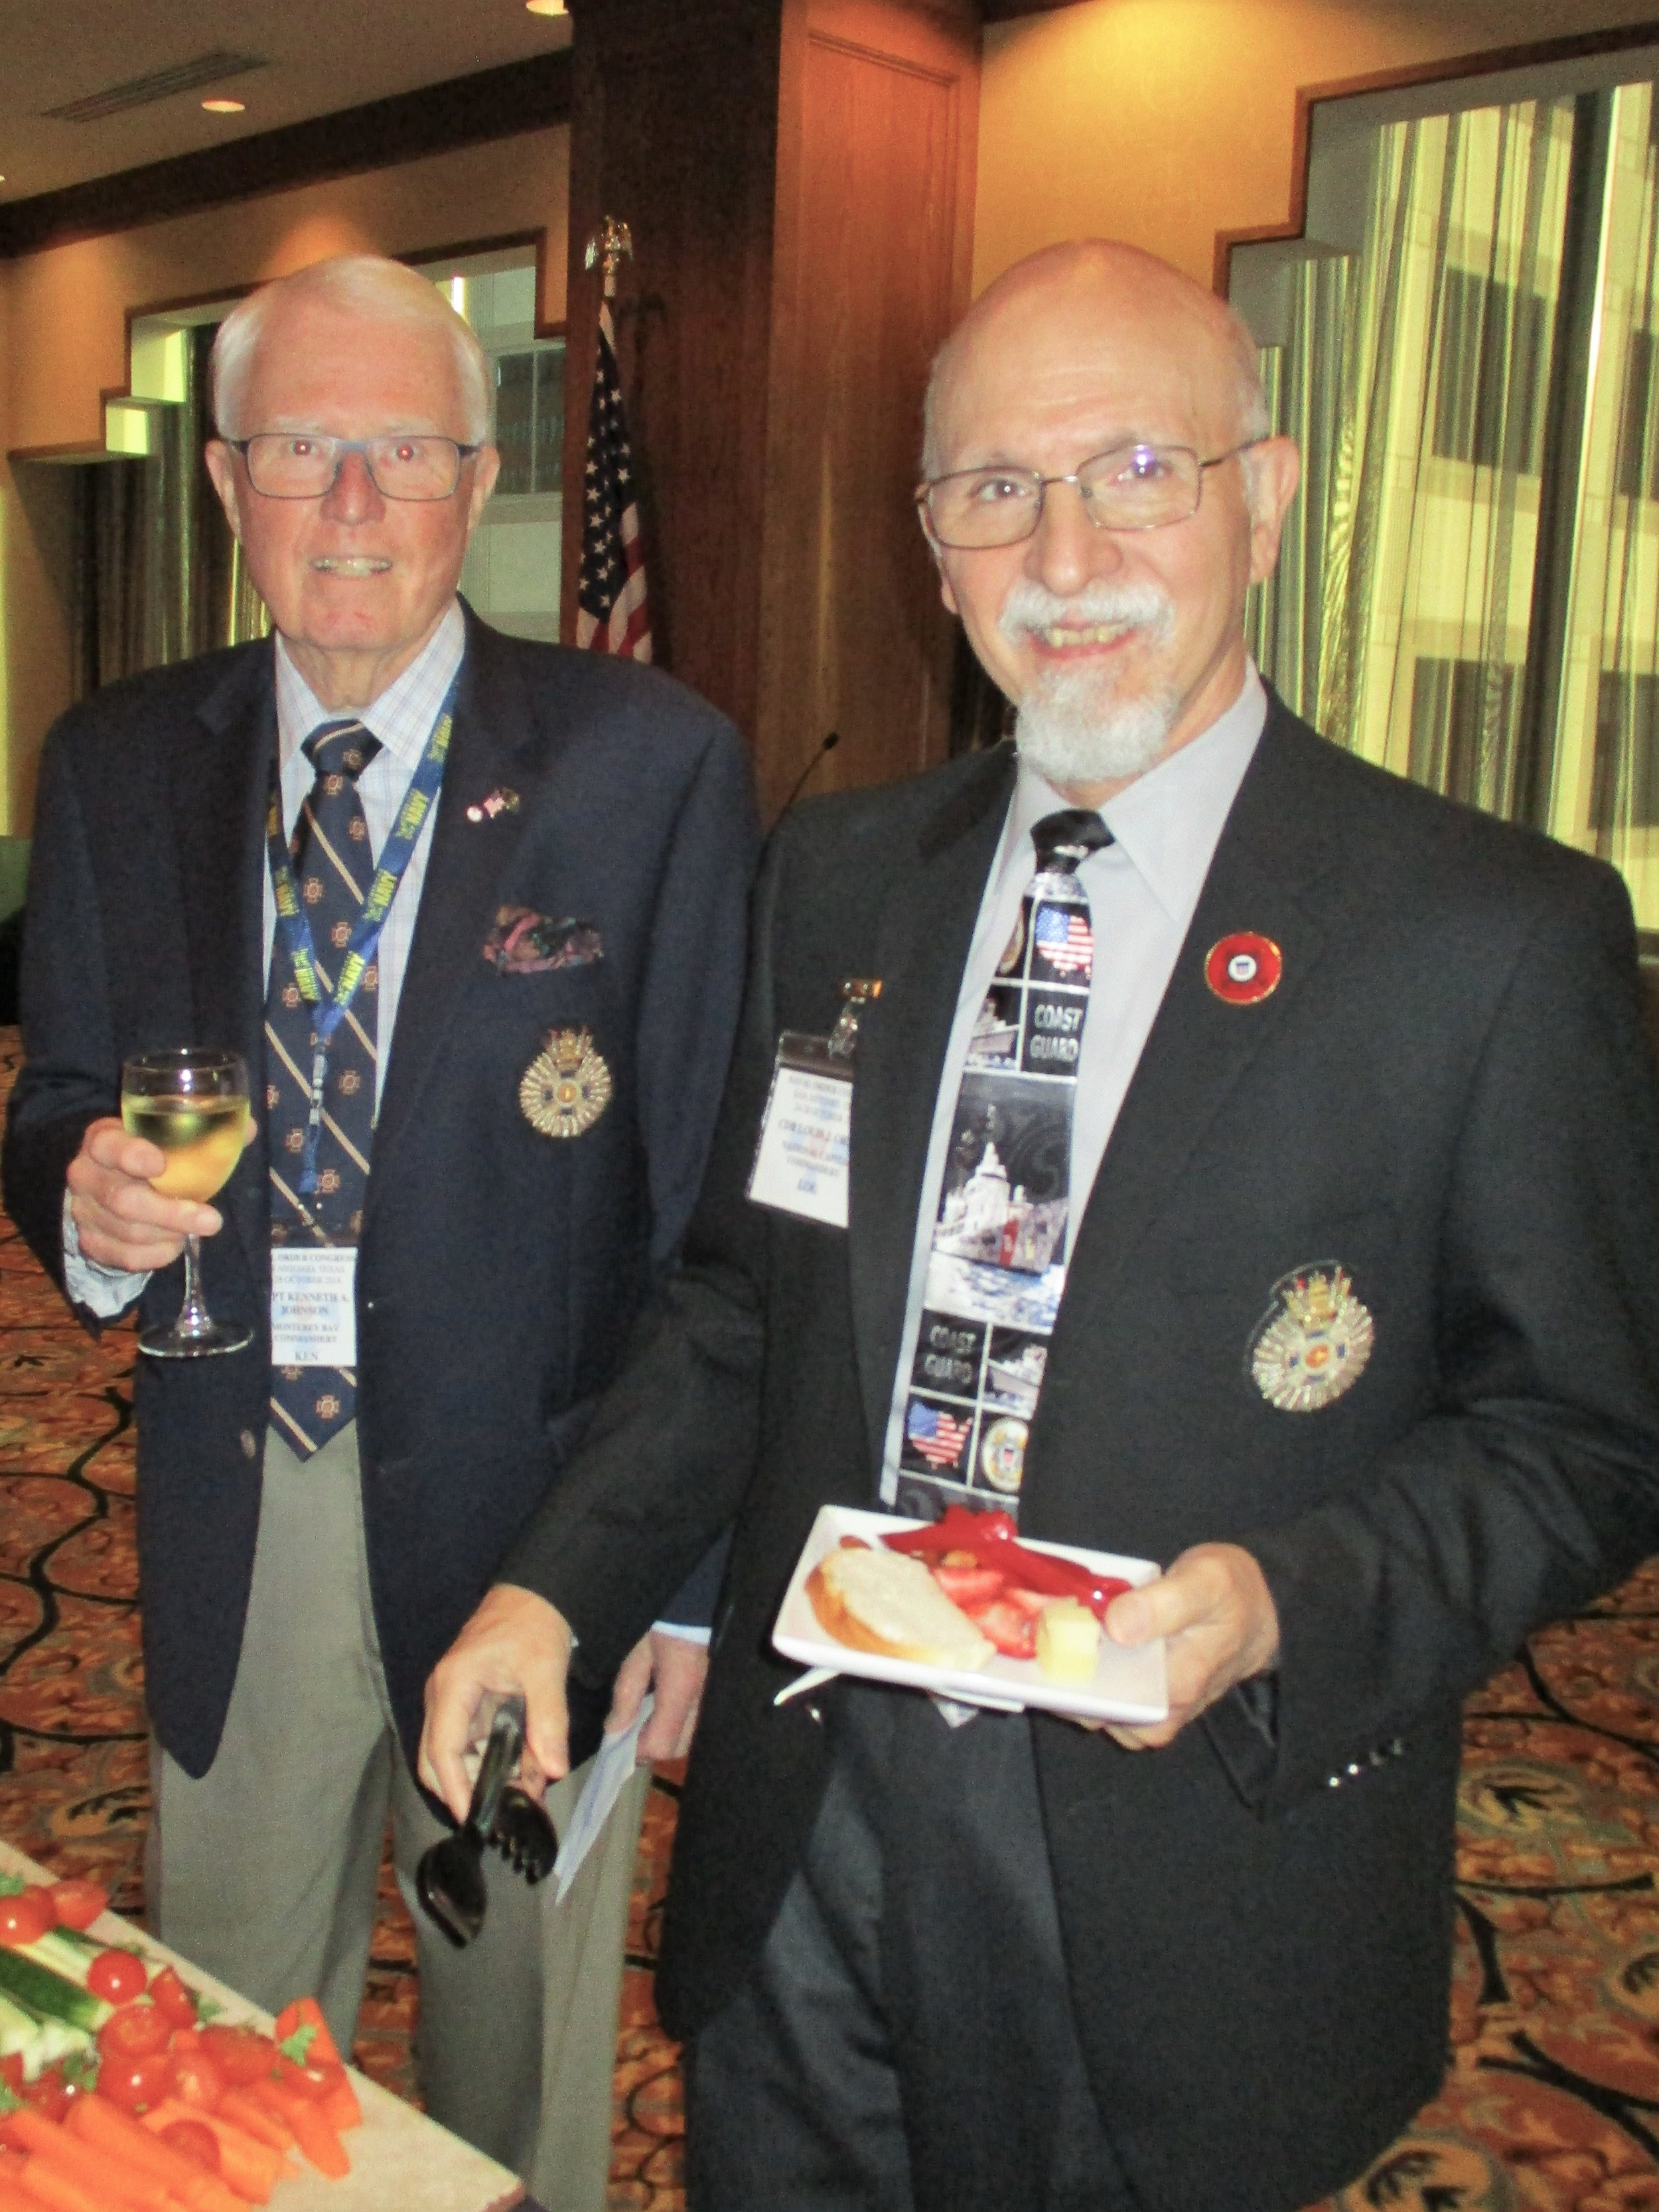 CAPT Ken Johnson and CDR Lou Orsini